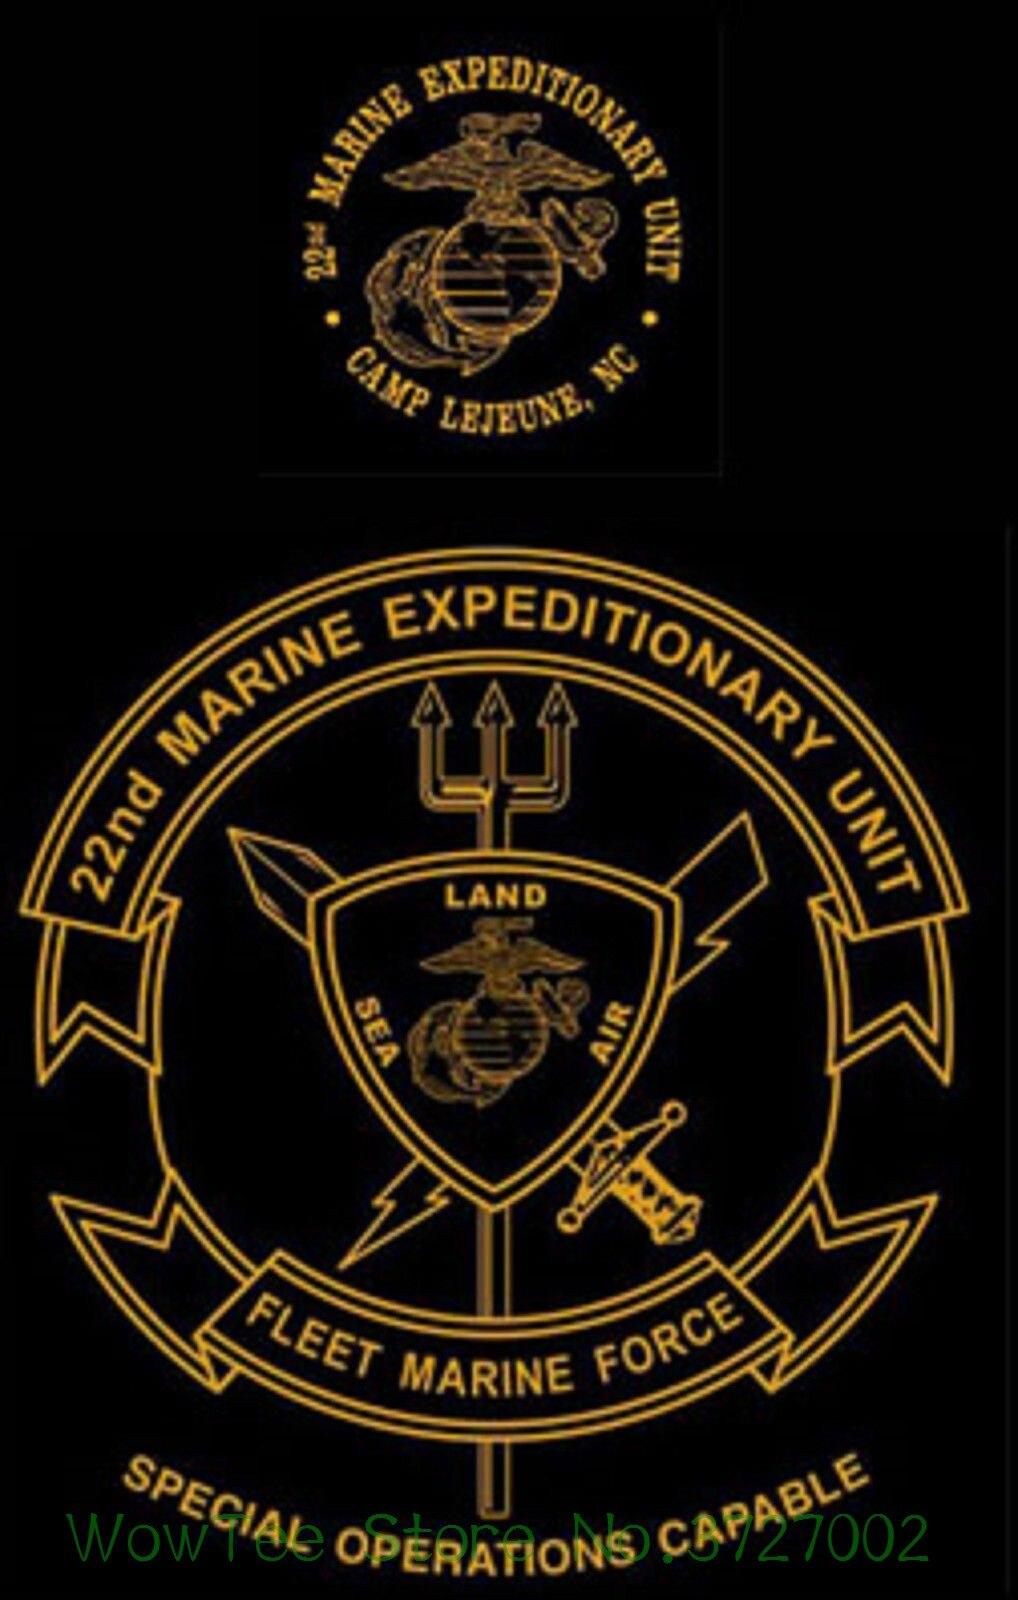 US $14 15 8% OFF|Marine Corps 22nd Marine Expeditionary Unit Meu Soc Camp  Lejeune , Nc Usmc Shirt Tshirt Men 2018 New-in T-Shirts from Men's Clothing